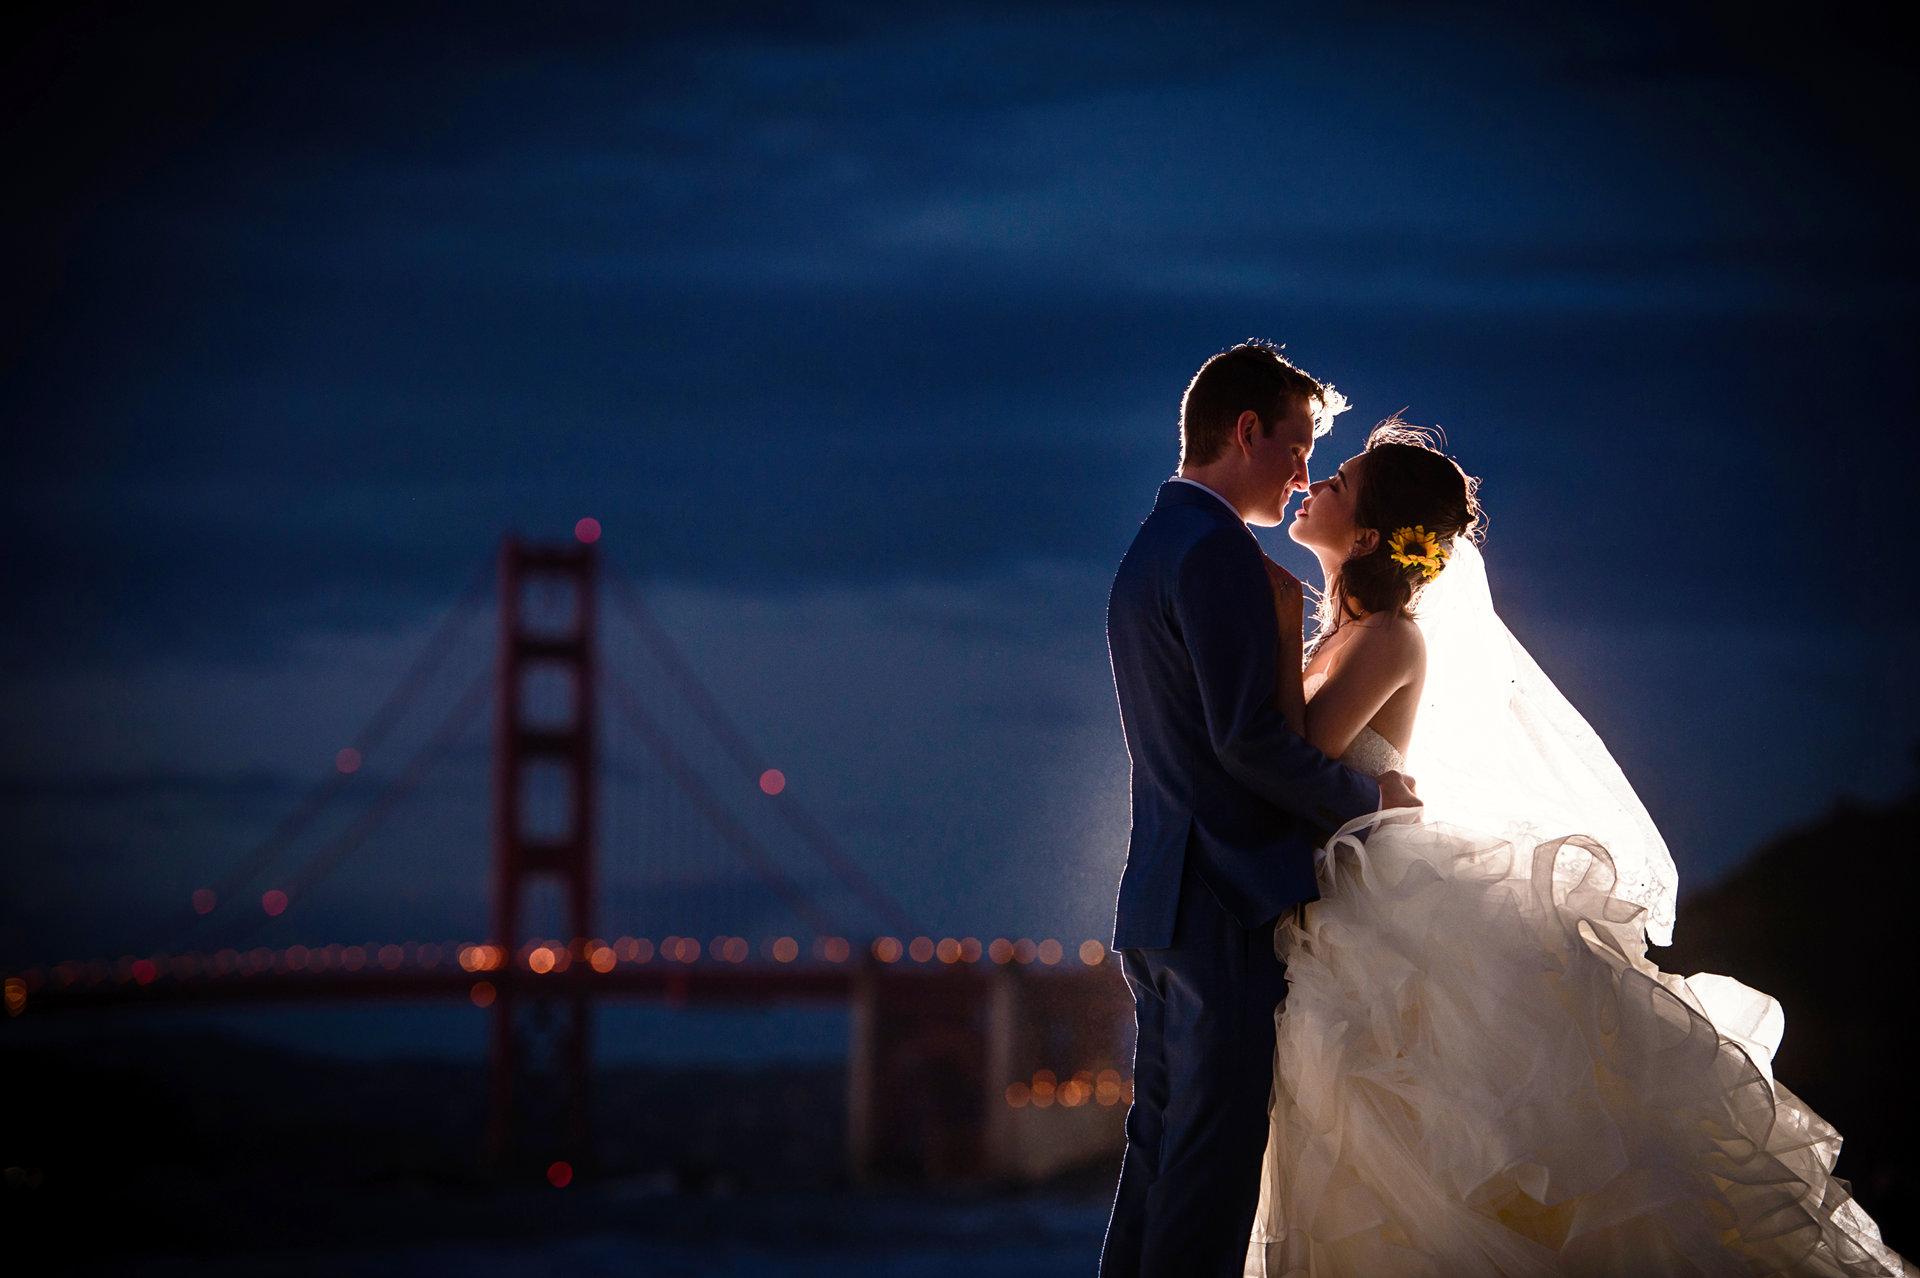 Los Angeles San Francisco Wedding Photographer Tommy Xing 美国洛杉矶旧金山婚礼婚纱照摄影师